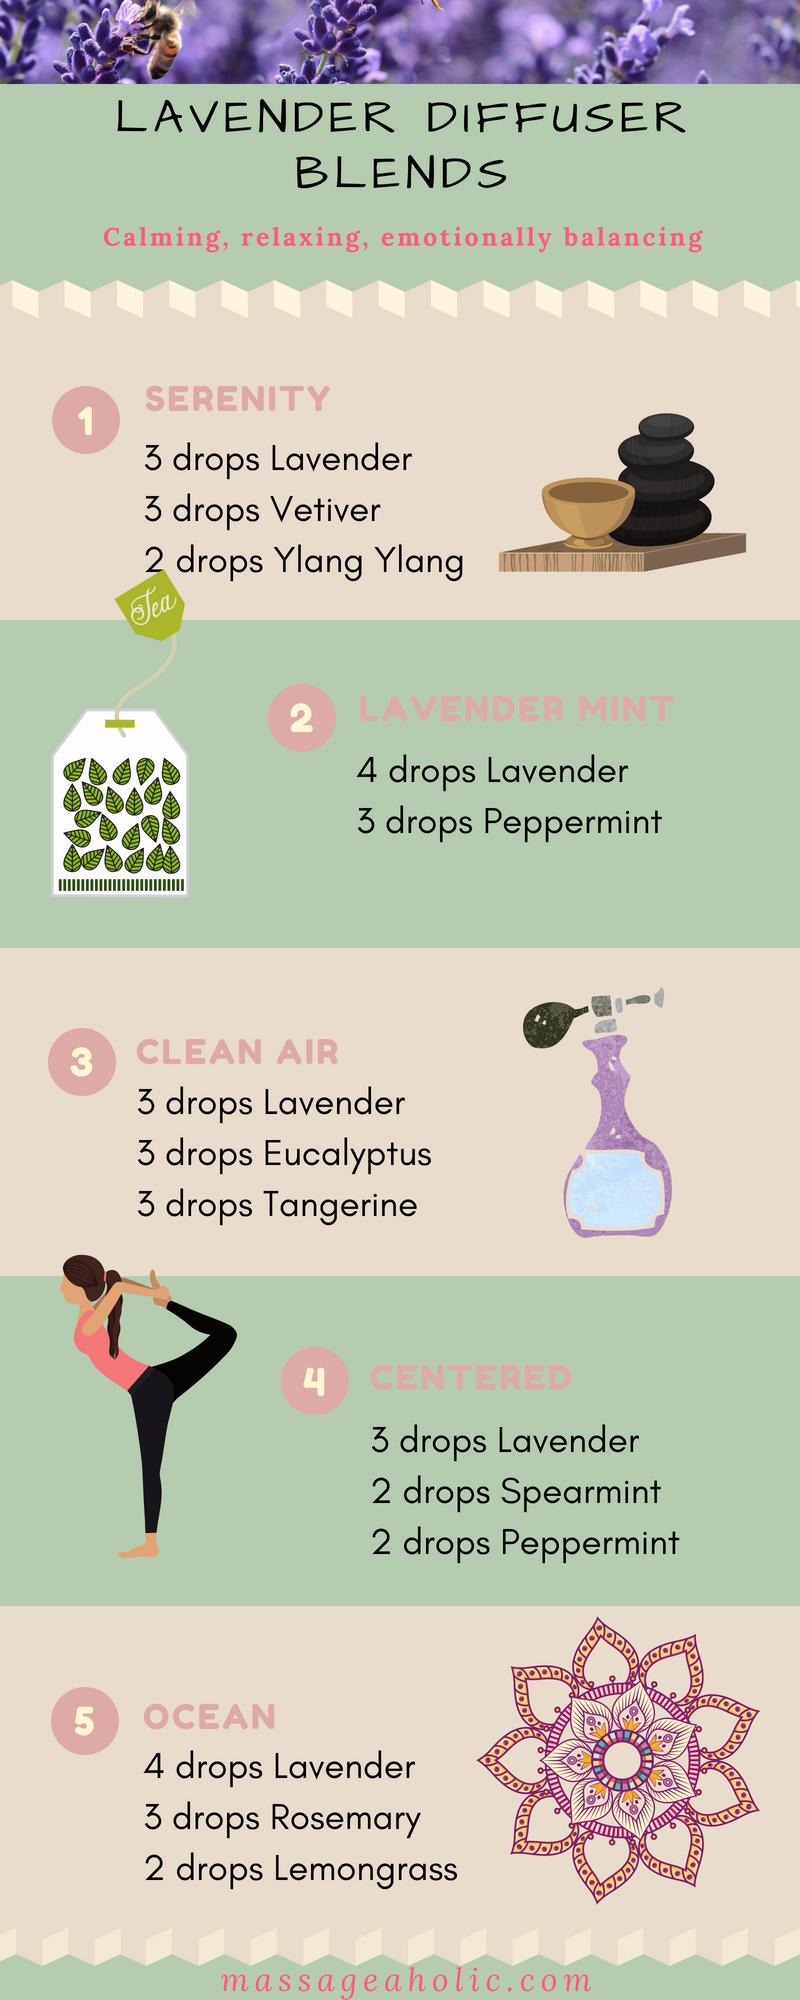 Lavender diffuser blends, lavender essential oil, #lavender, #essentialoils, #relaxing, #calming